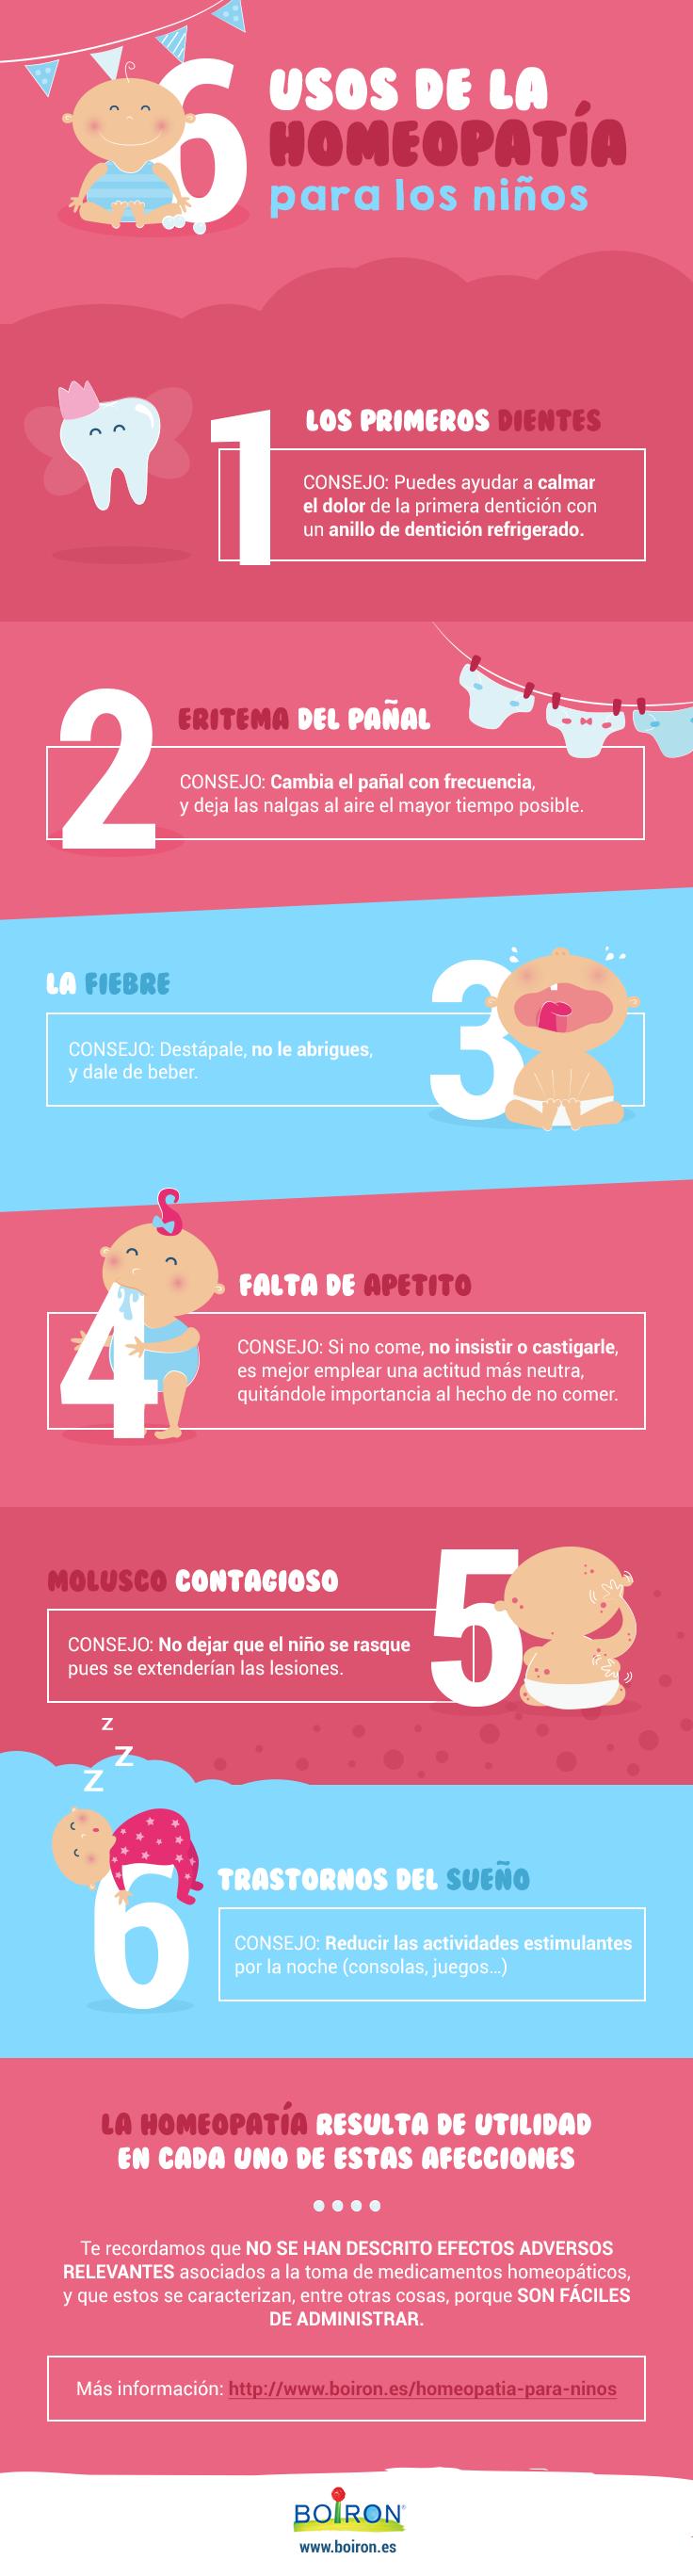 decalogo_homeopatia_usos_bebes